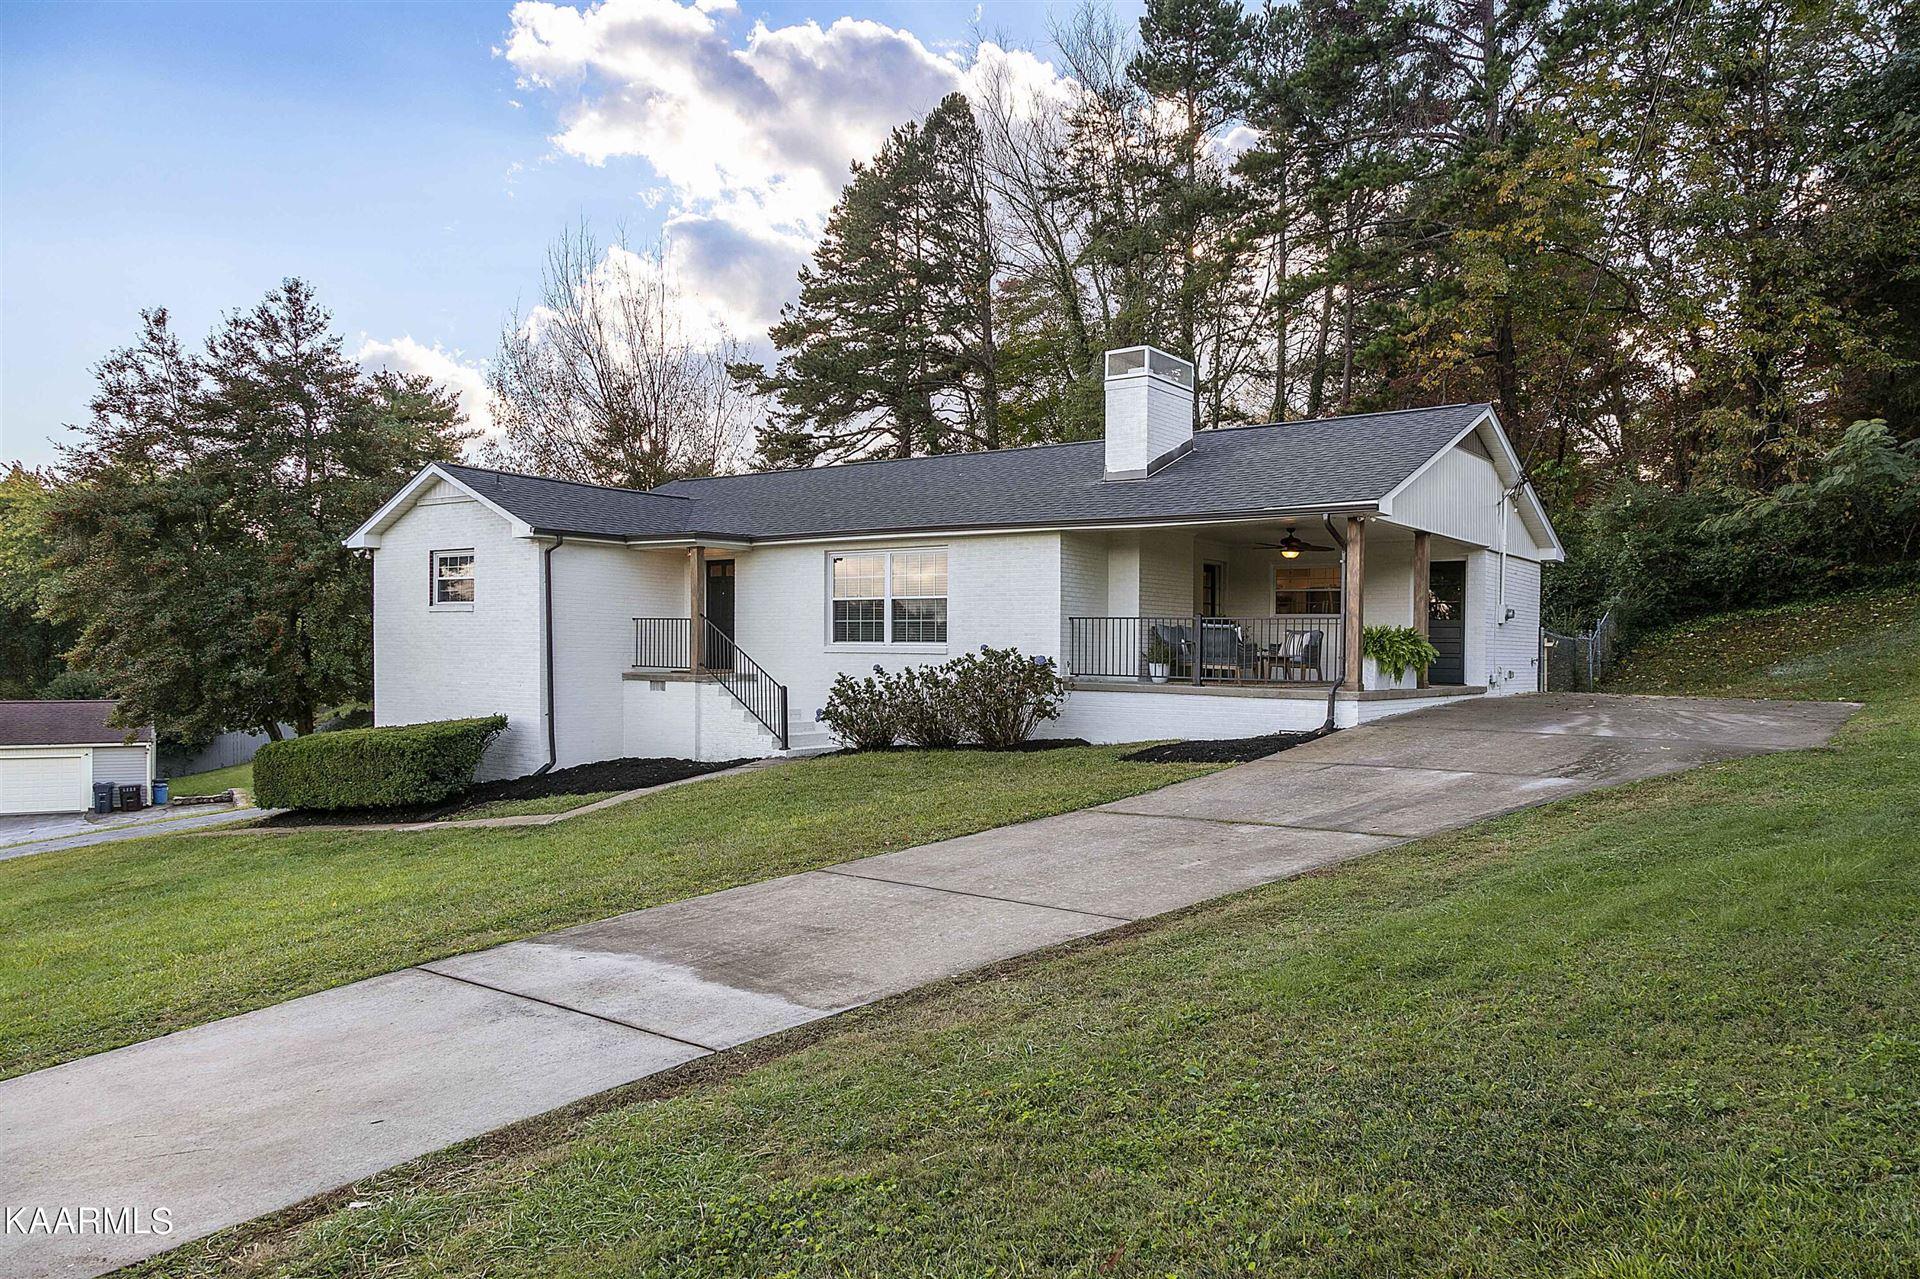 Photo of 4709 Santala Drive, Knoxville, TN 37909 (MLS # 1171862)